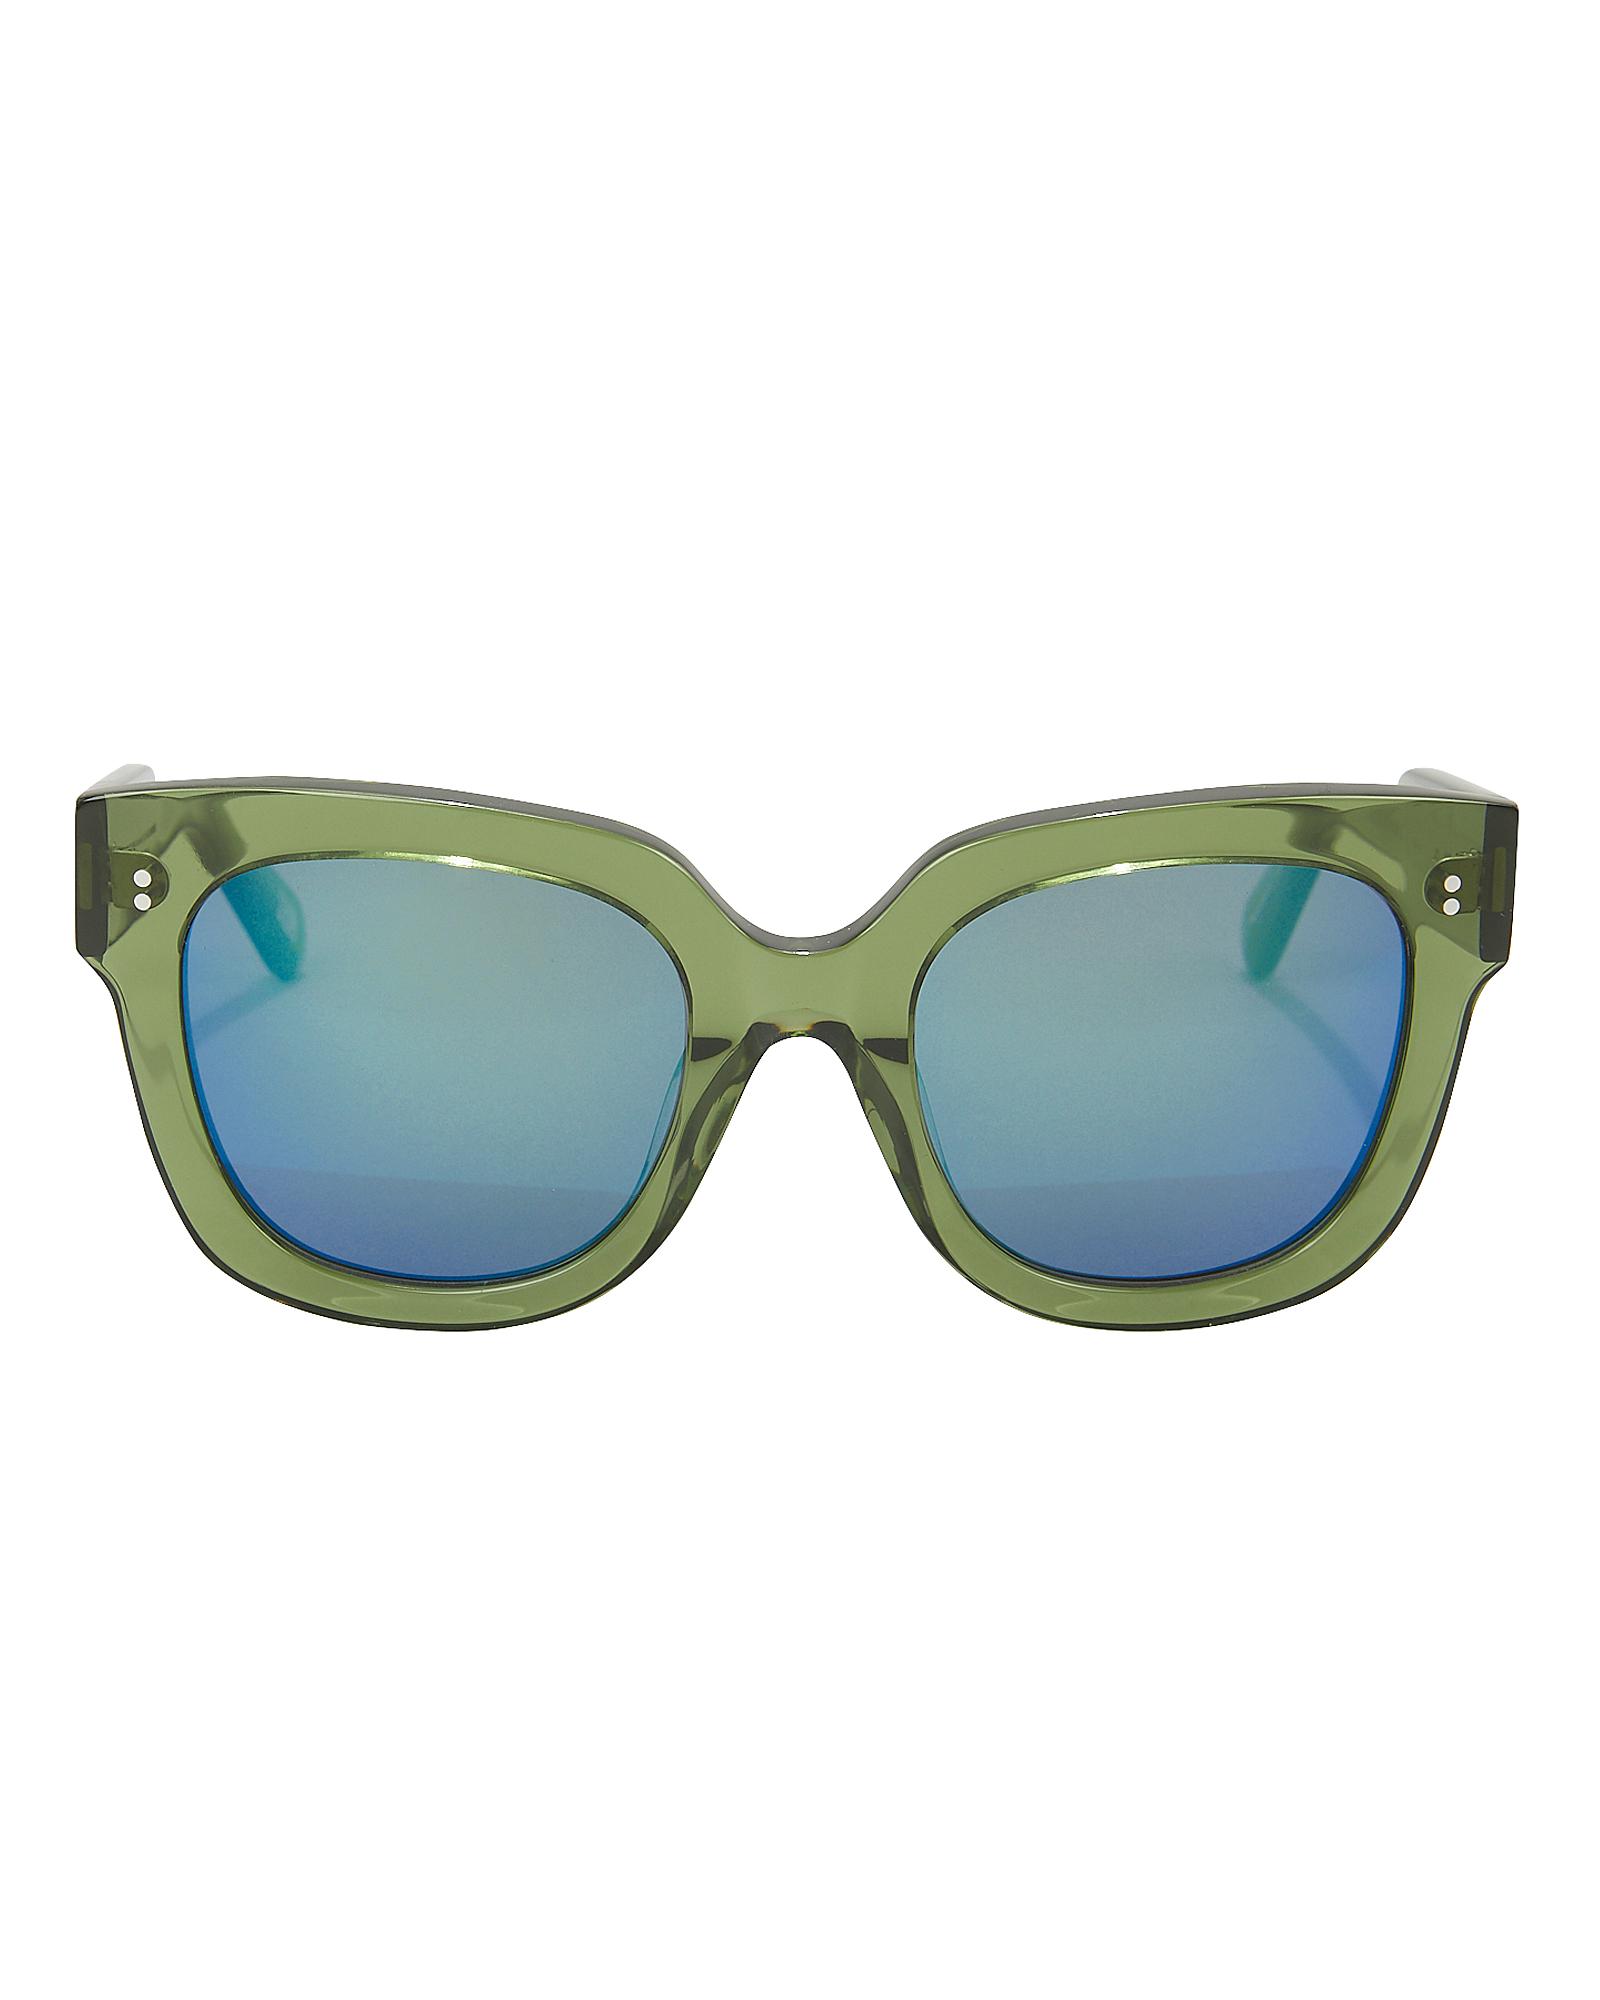 CHIMI EYEWEAR 008 Green Sunglasses